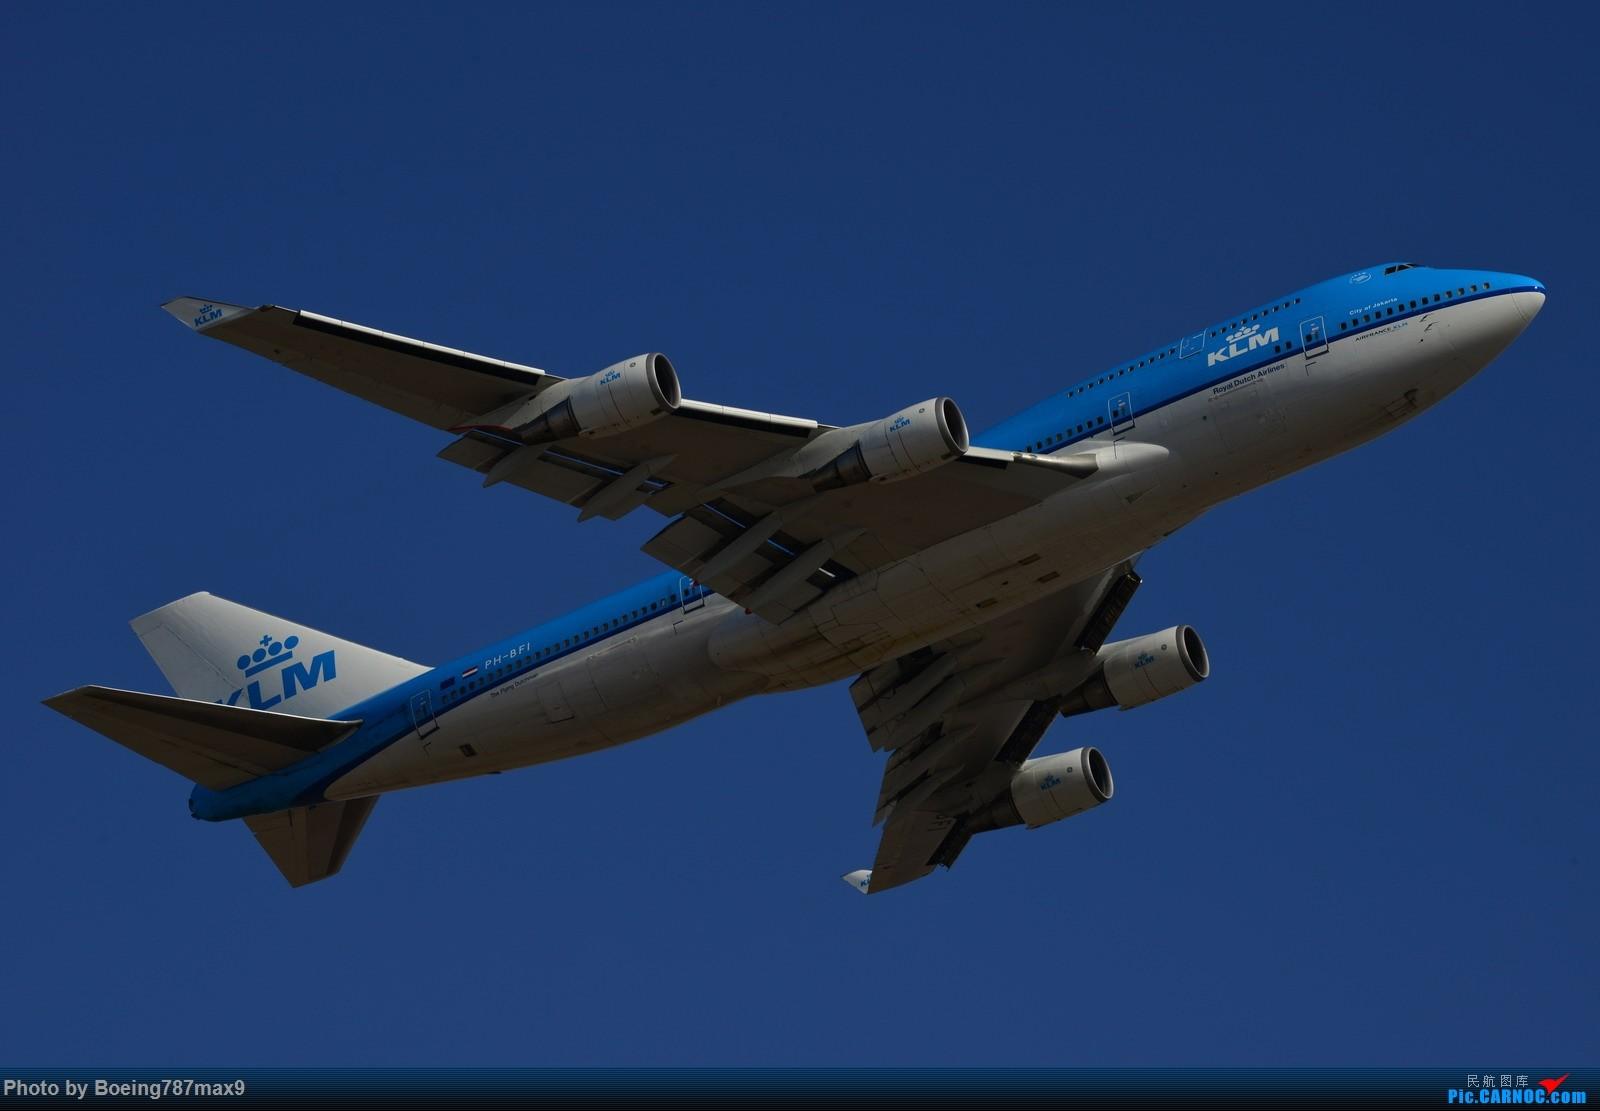 Re:[原创]【PEK】今日东停车场蹲点,好货一堆。KLM744、DELTA763、国航星空332、国航748、最重要的是朝鲜的图204、还有国航中法50年77W、汉莎346 BOEING 747-400 PH-BFI 中国北京首都国际机场